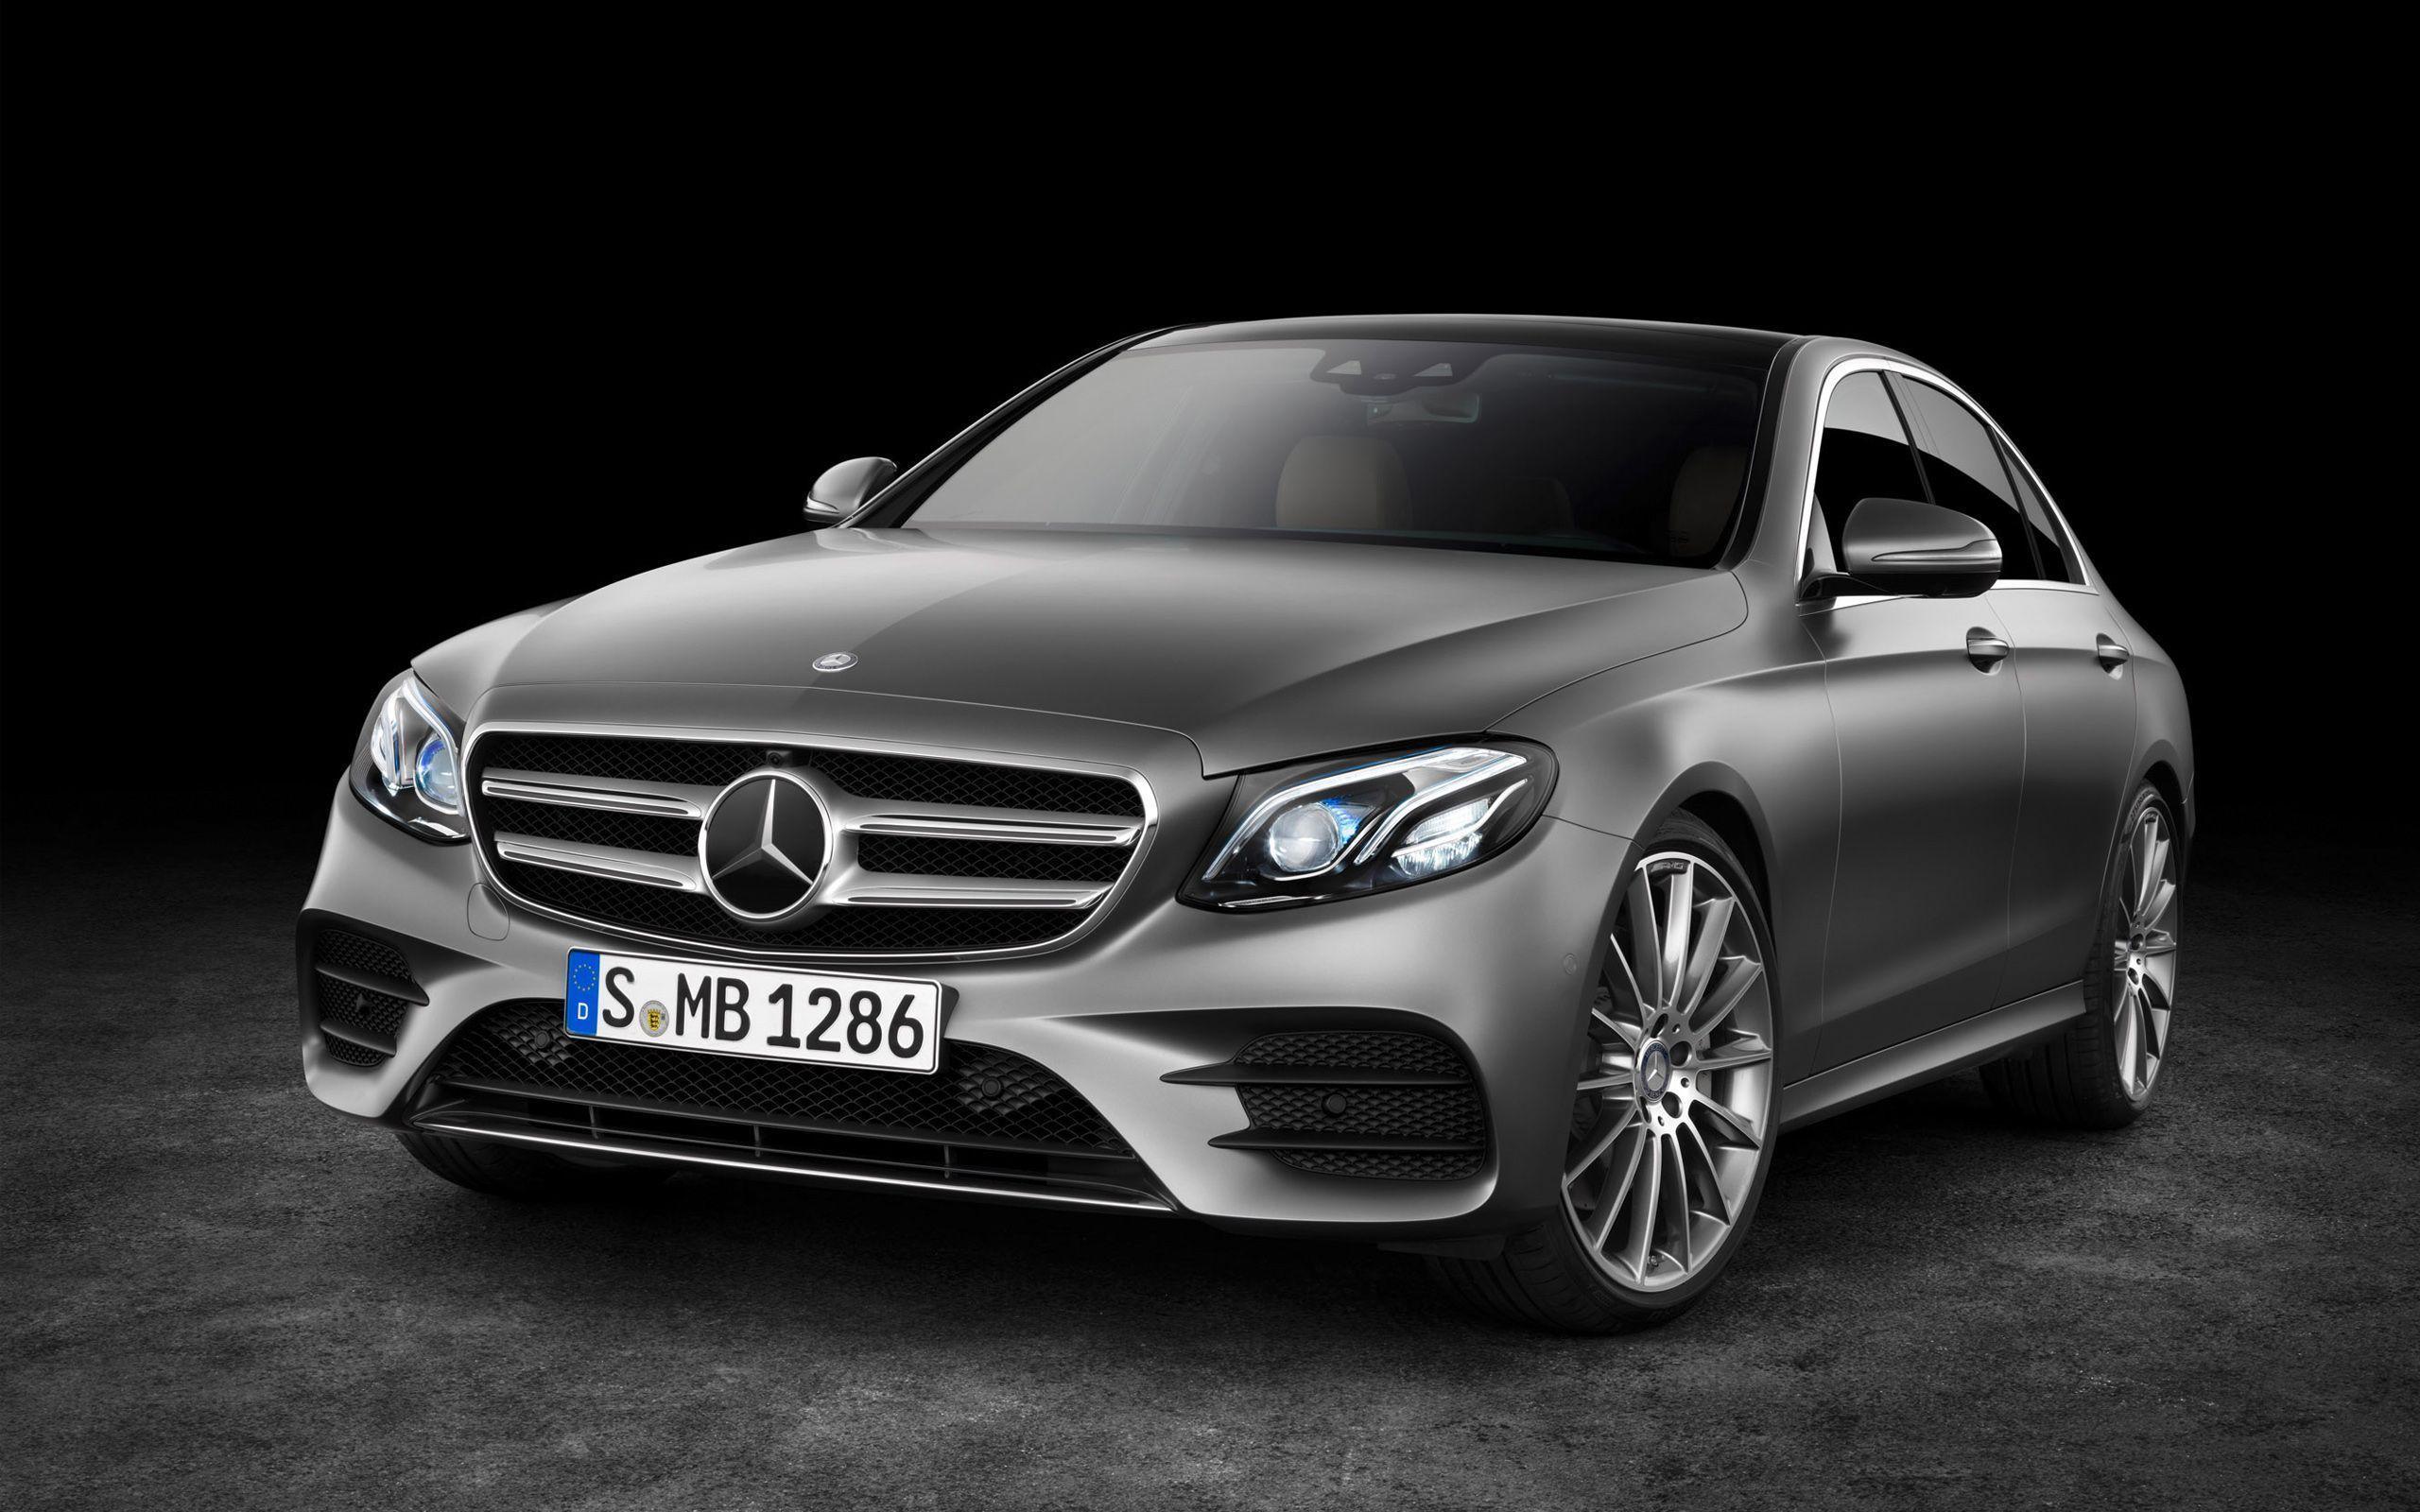 2017 Mercedes Benz E-class Wallpaper Iphone (33006) - heidi24